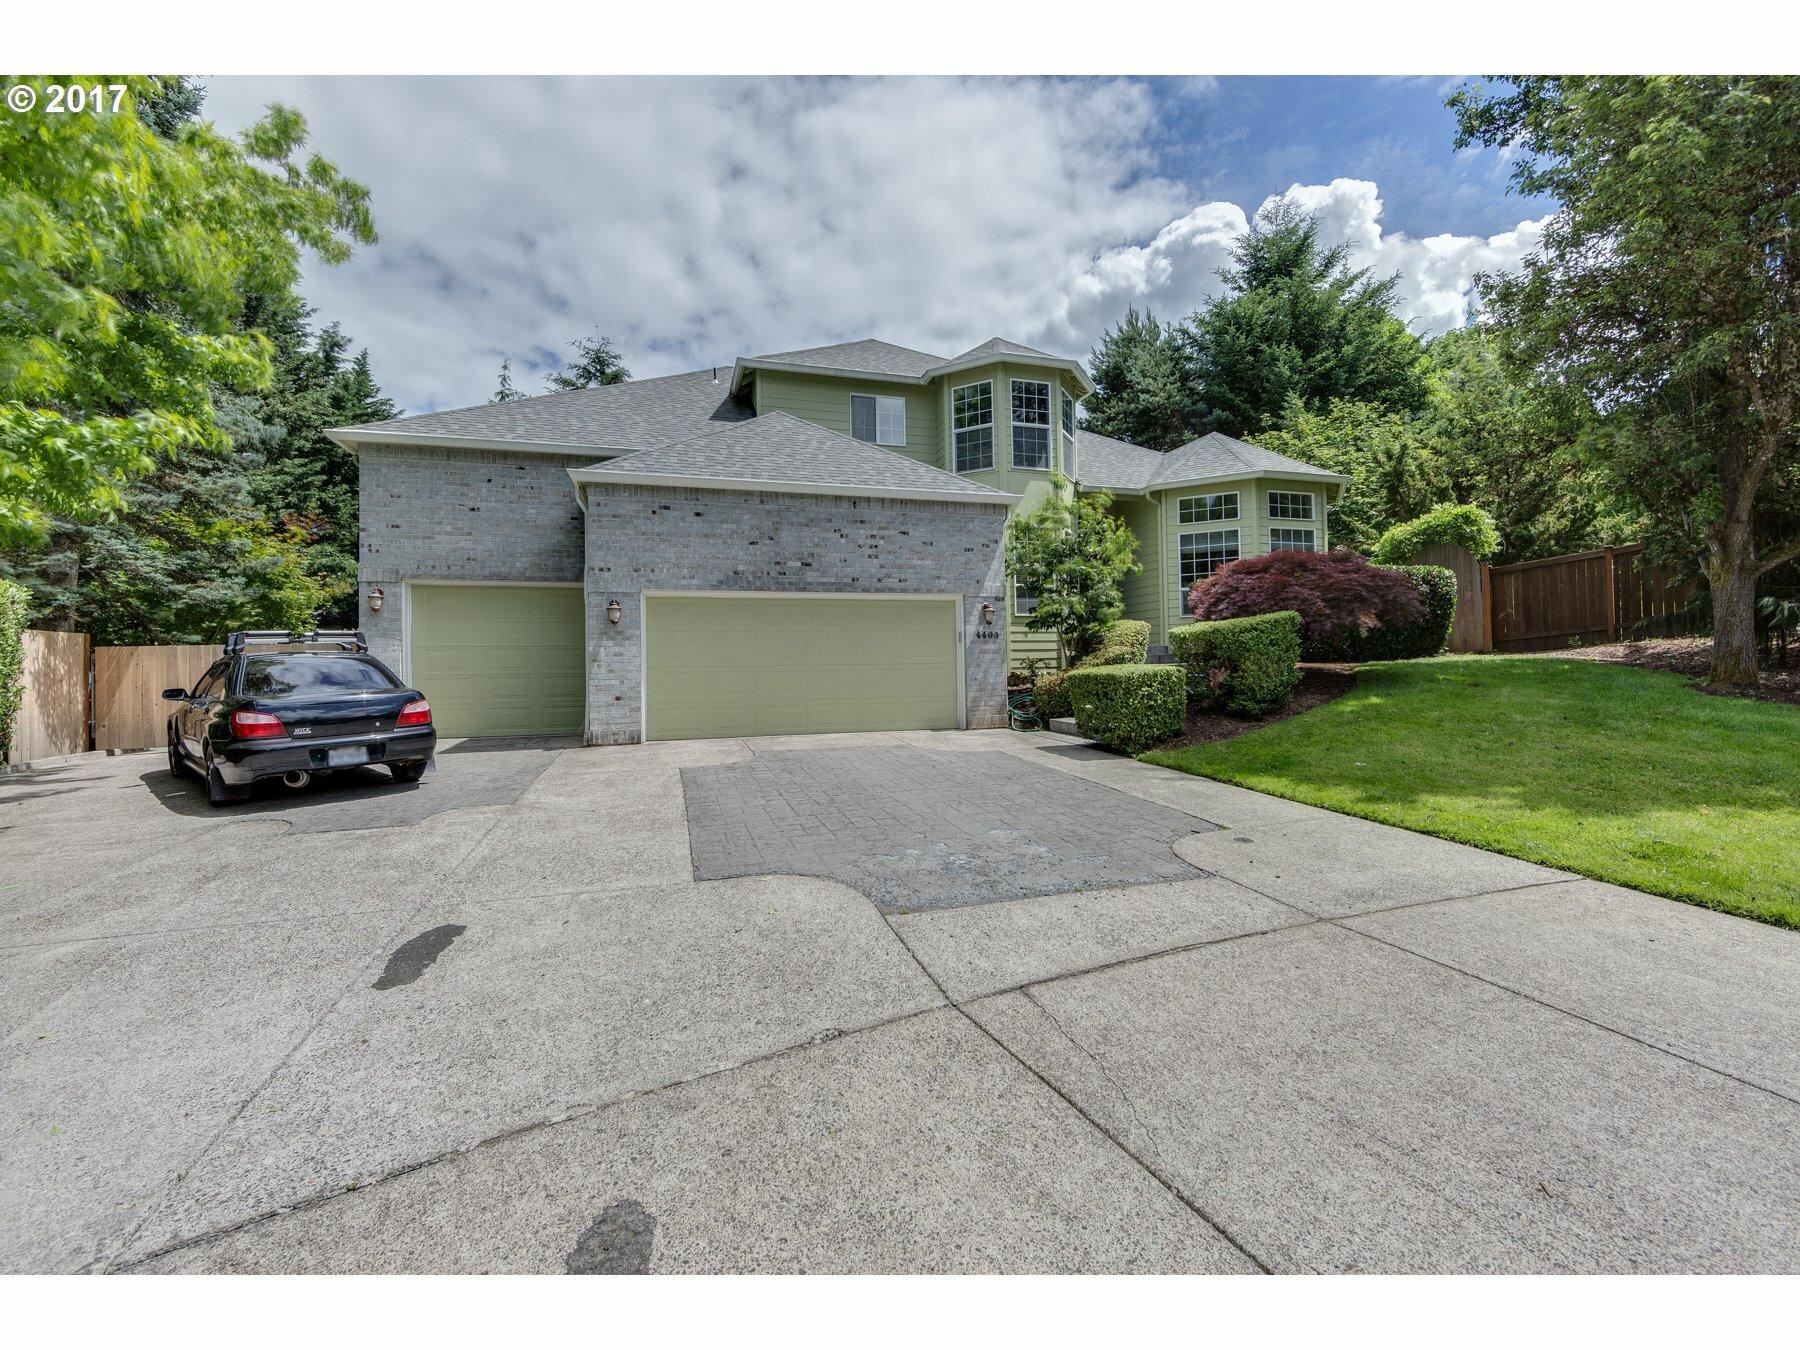 4409 Ne 141st Cir, Vancouver, WA - USA (photo 2)